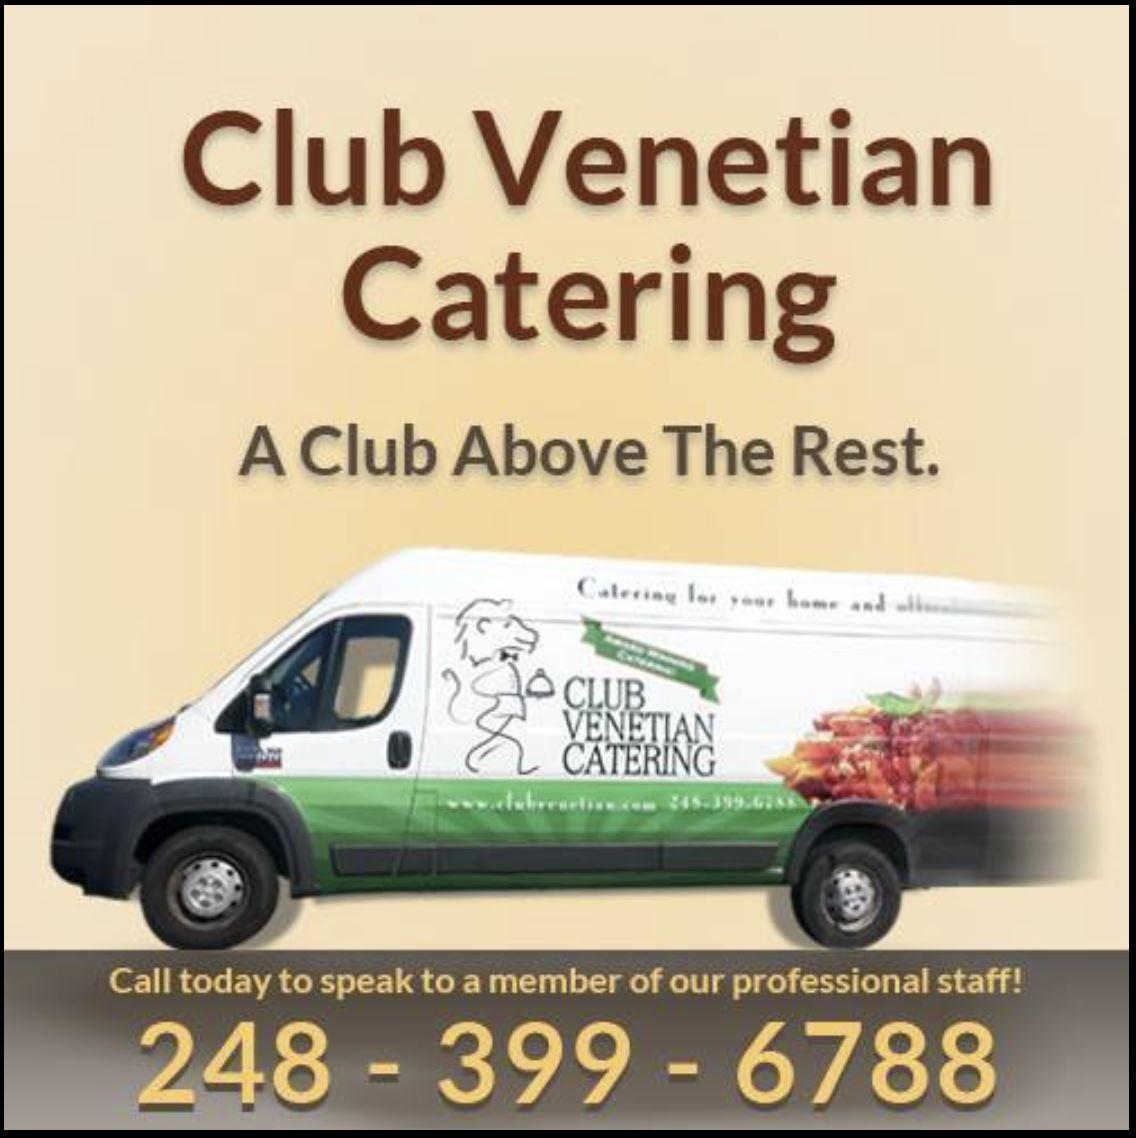 Club Venetian Catering